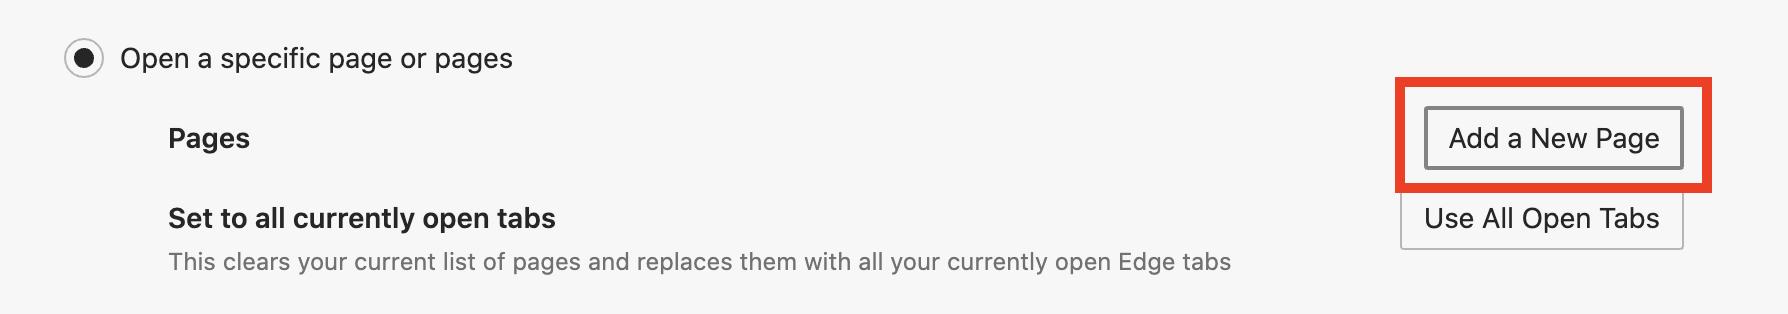 Home Page ကို Microsoft Edge တွင်မည်သို့ထားရမည်နည်း